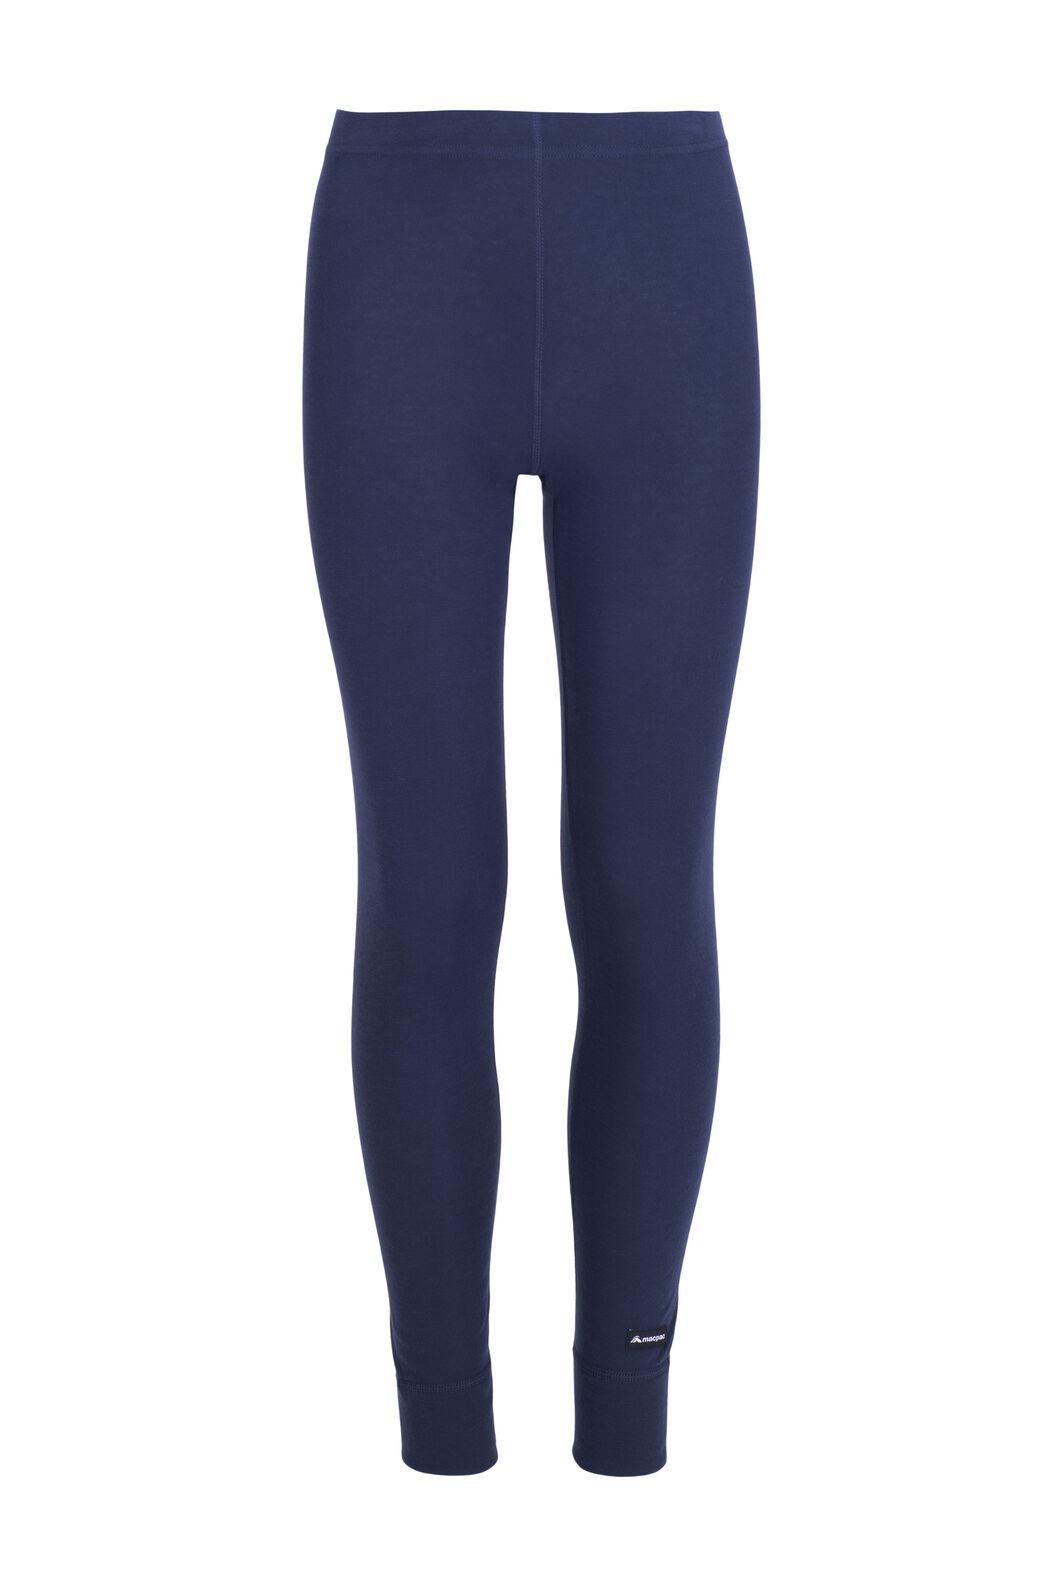 Macpac Kids' Geothermal Pants, Black Iris, hi-res